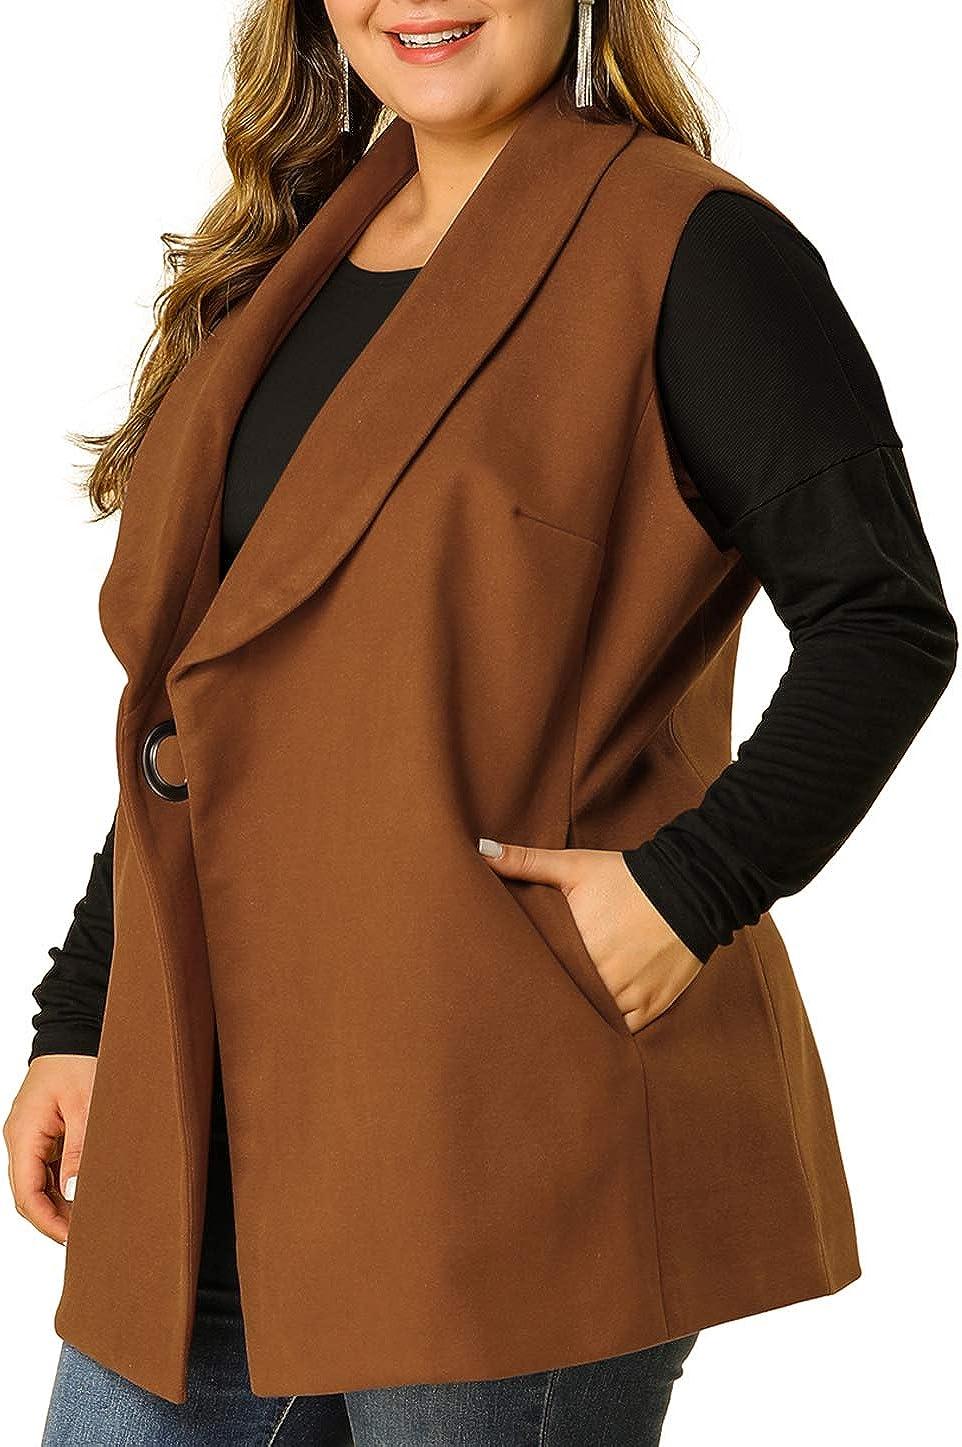 Agnes Orinda Women's Plus Size Jacket Open Front Belted Vests Notch Lapel Work Casual Vest